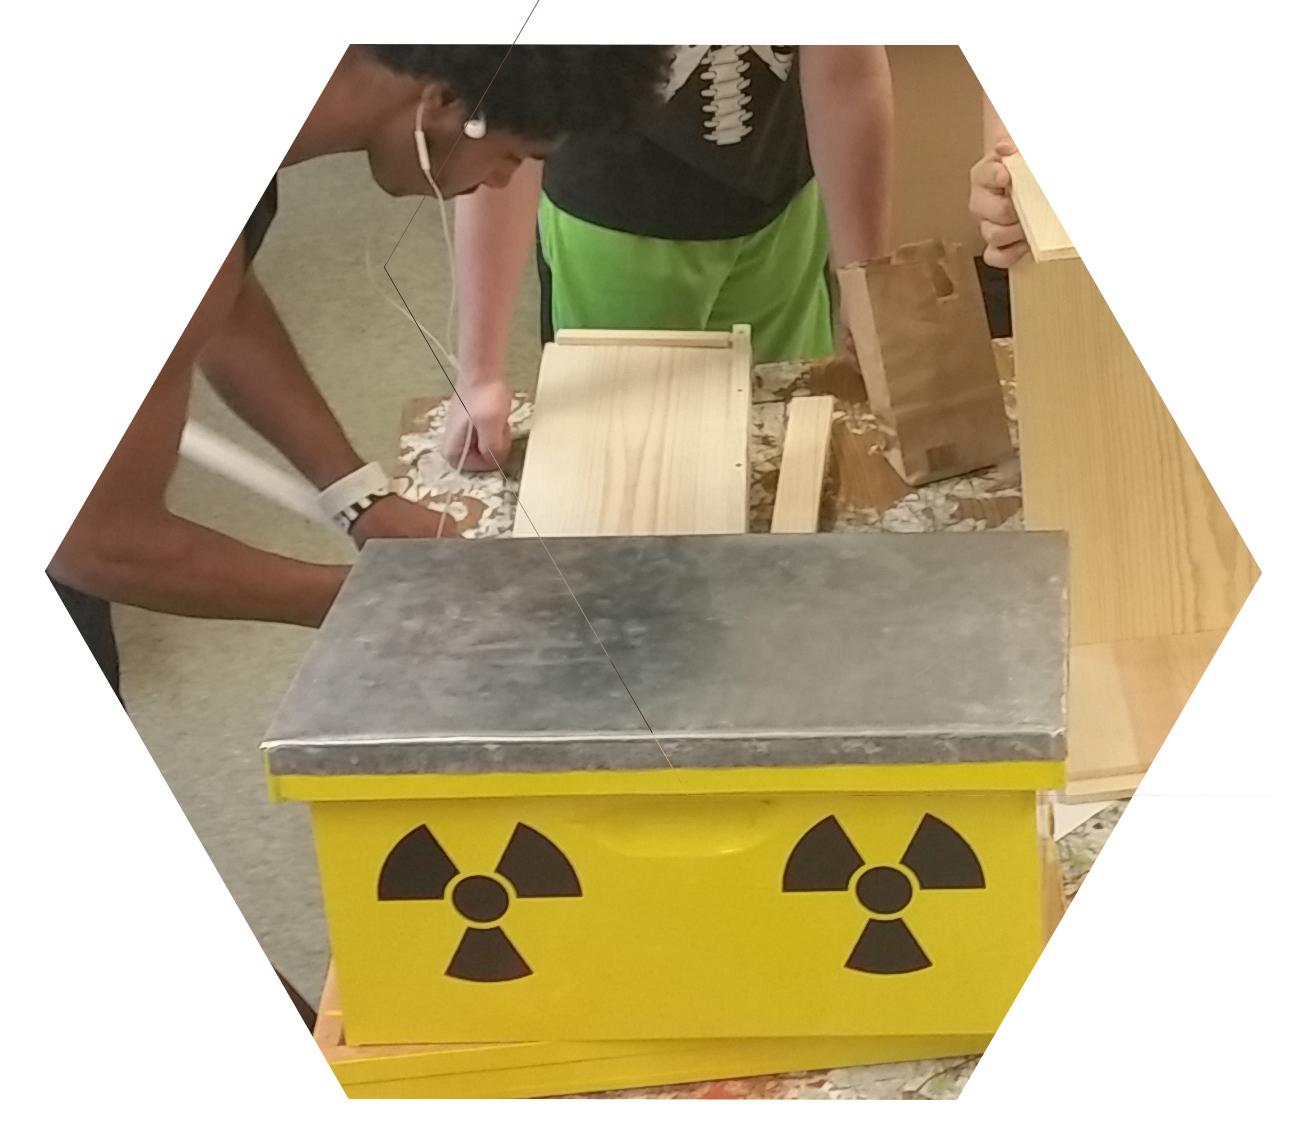 honeycomb-hive-build.jpg